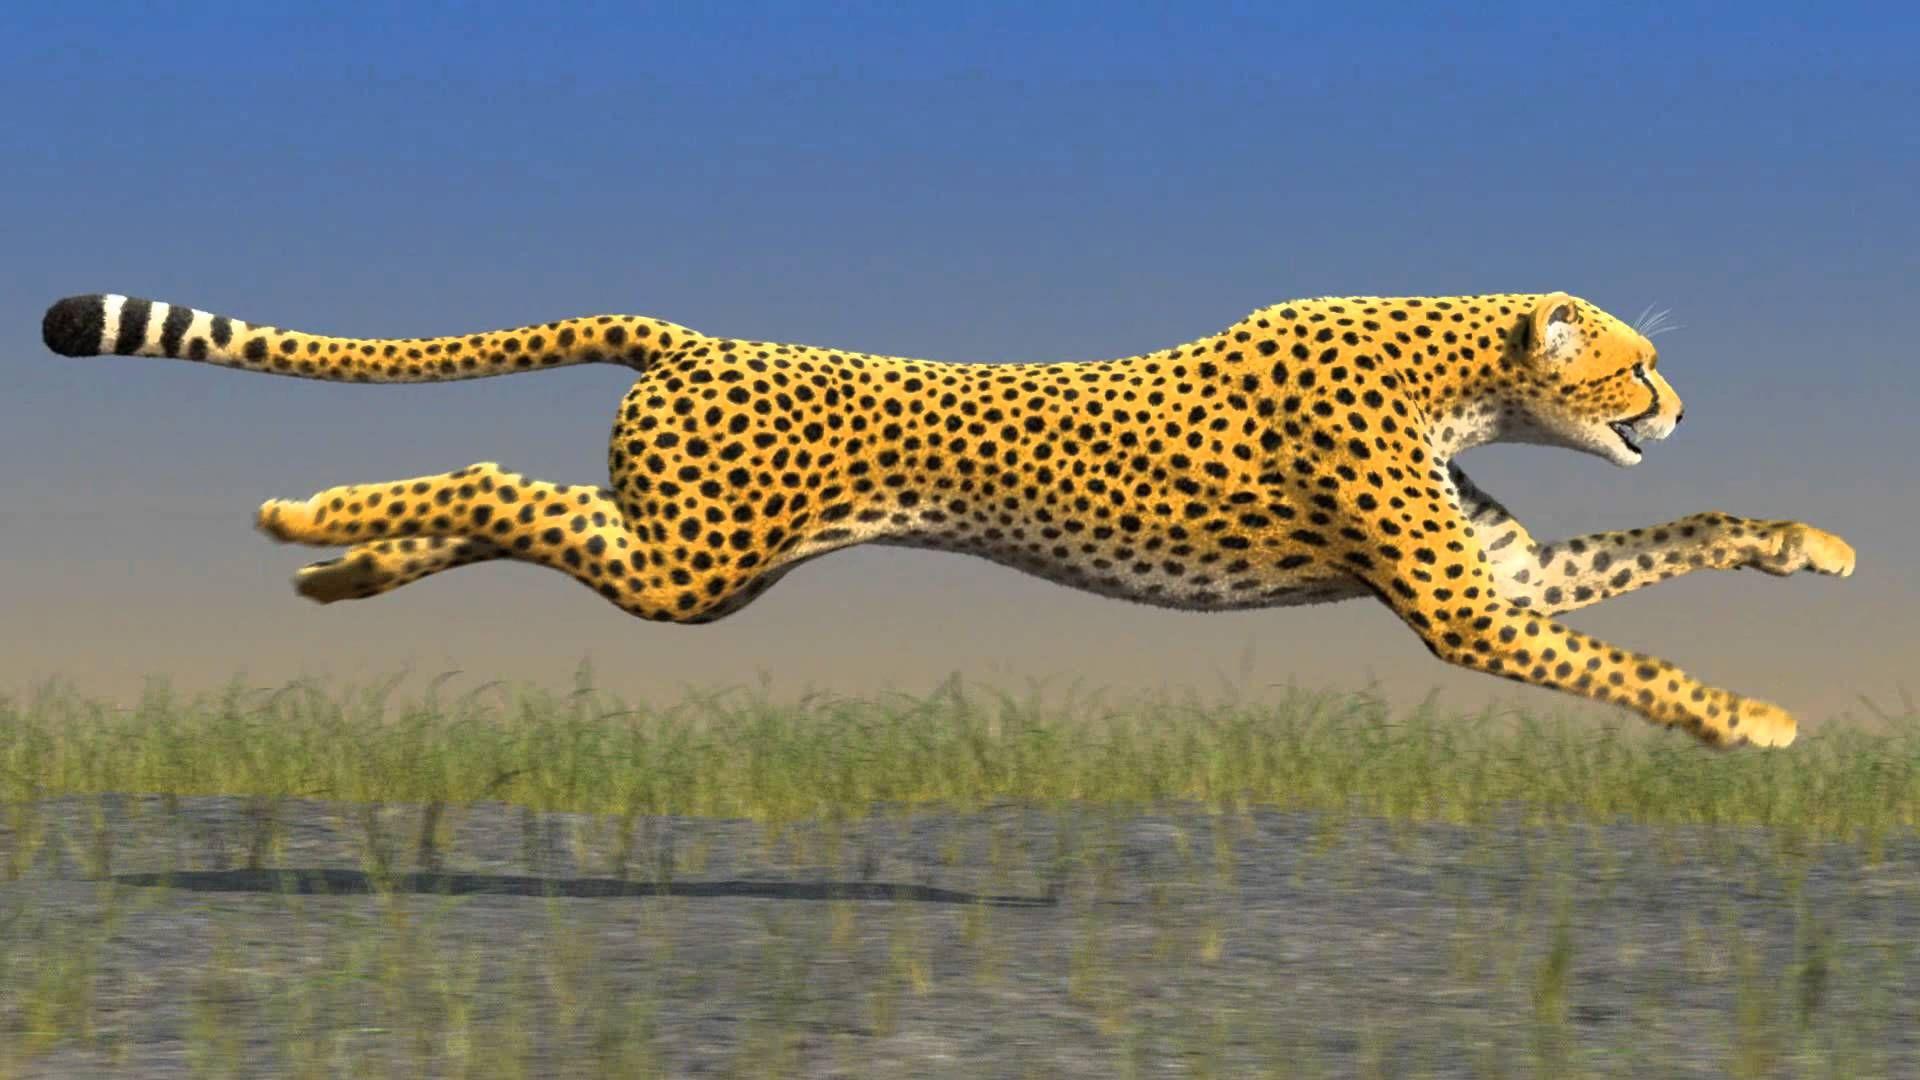 Maxresdefault Jpg 1920 1080 Cheetah Wallpaper Wallpaper Wallpaper Free Download